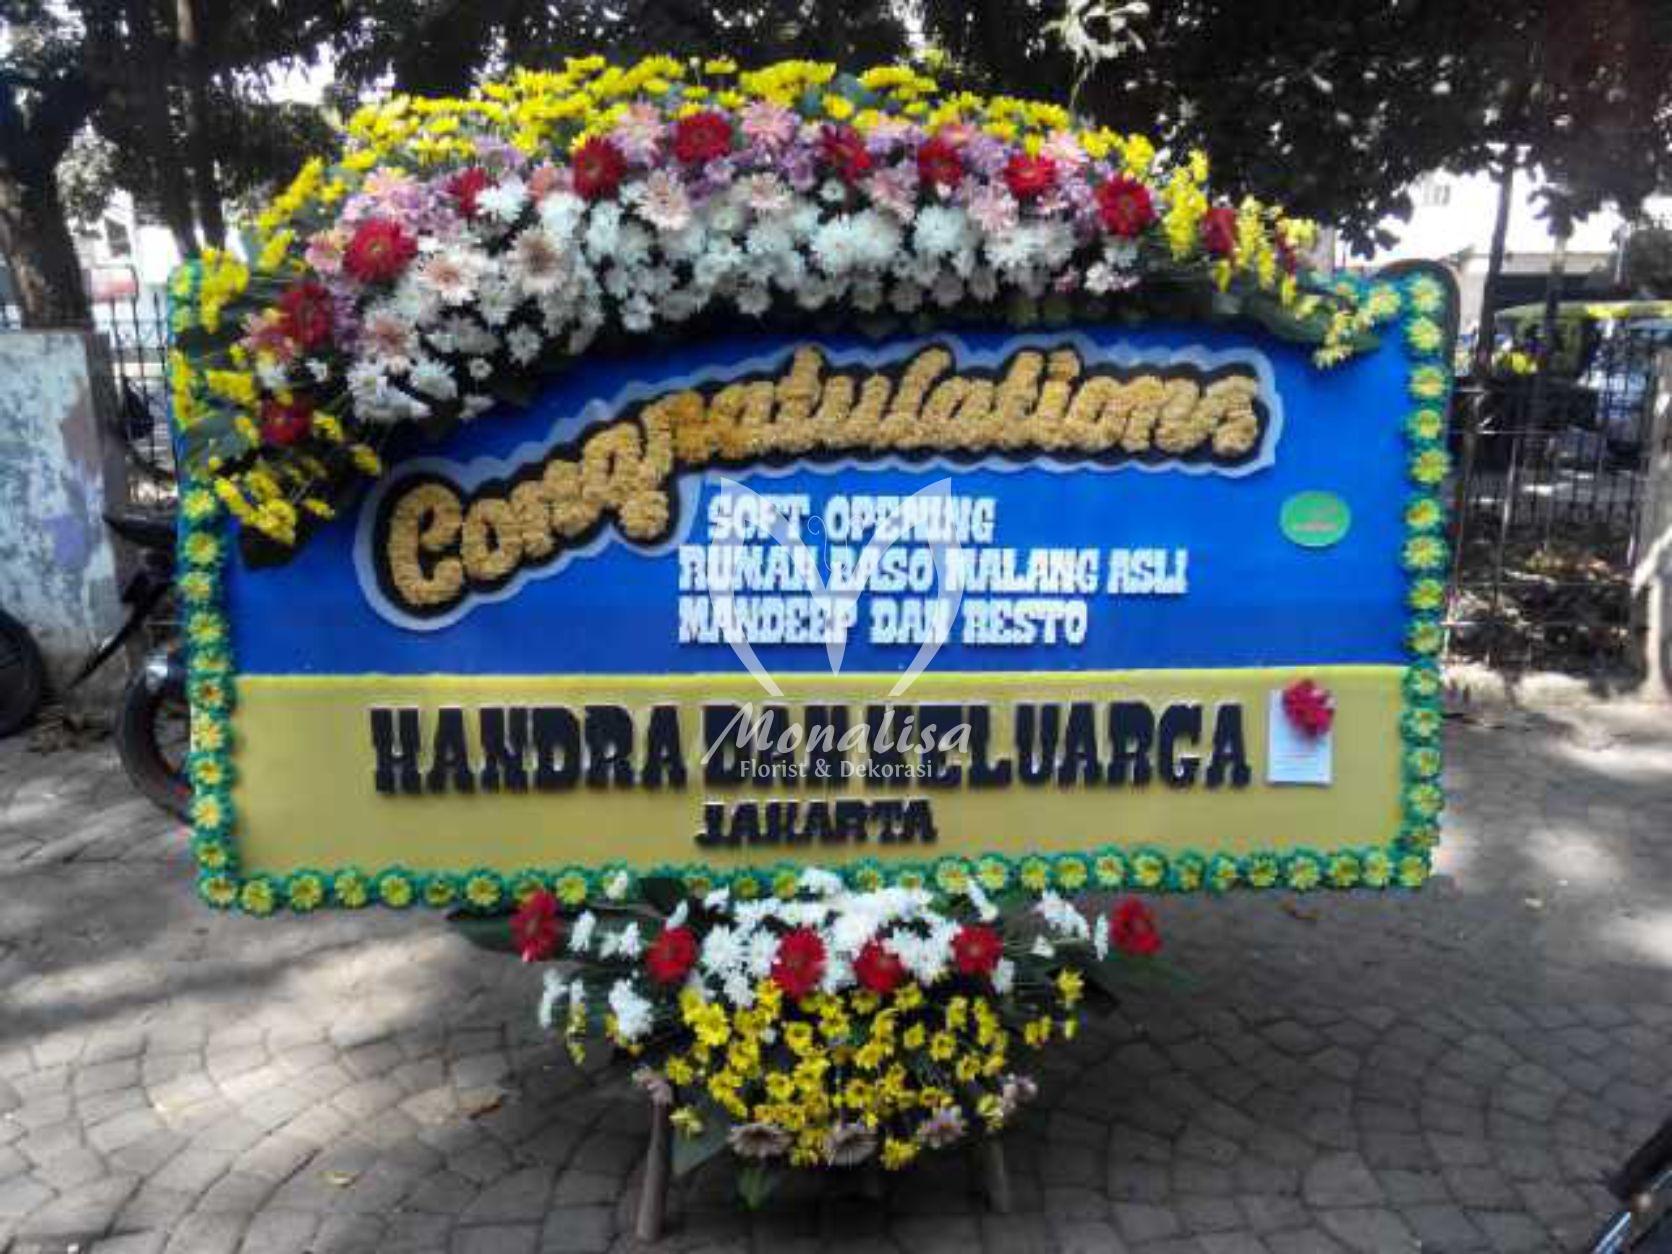 Bunga Papan Ucapan Selamat Congratulation Bpsl 0601 Toko Bunga Bandung Monalisa Florist Dekorasi Toko Bunga Di Bandung Toko Bunga Murah Bandung Florist Bandung Florist Di Bandung Florist Murah Bandung Toko